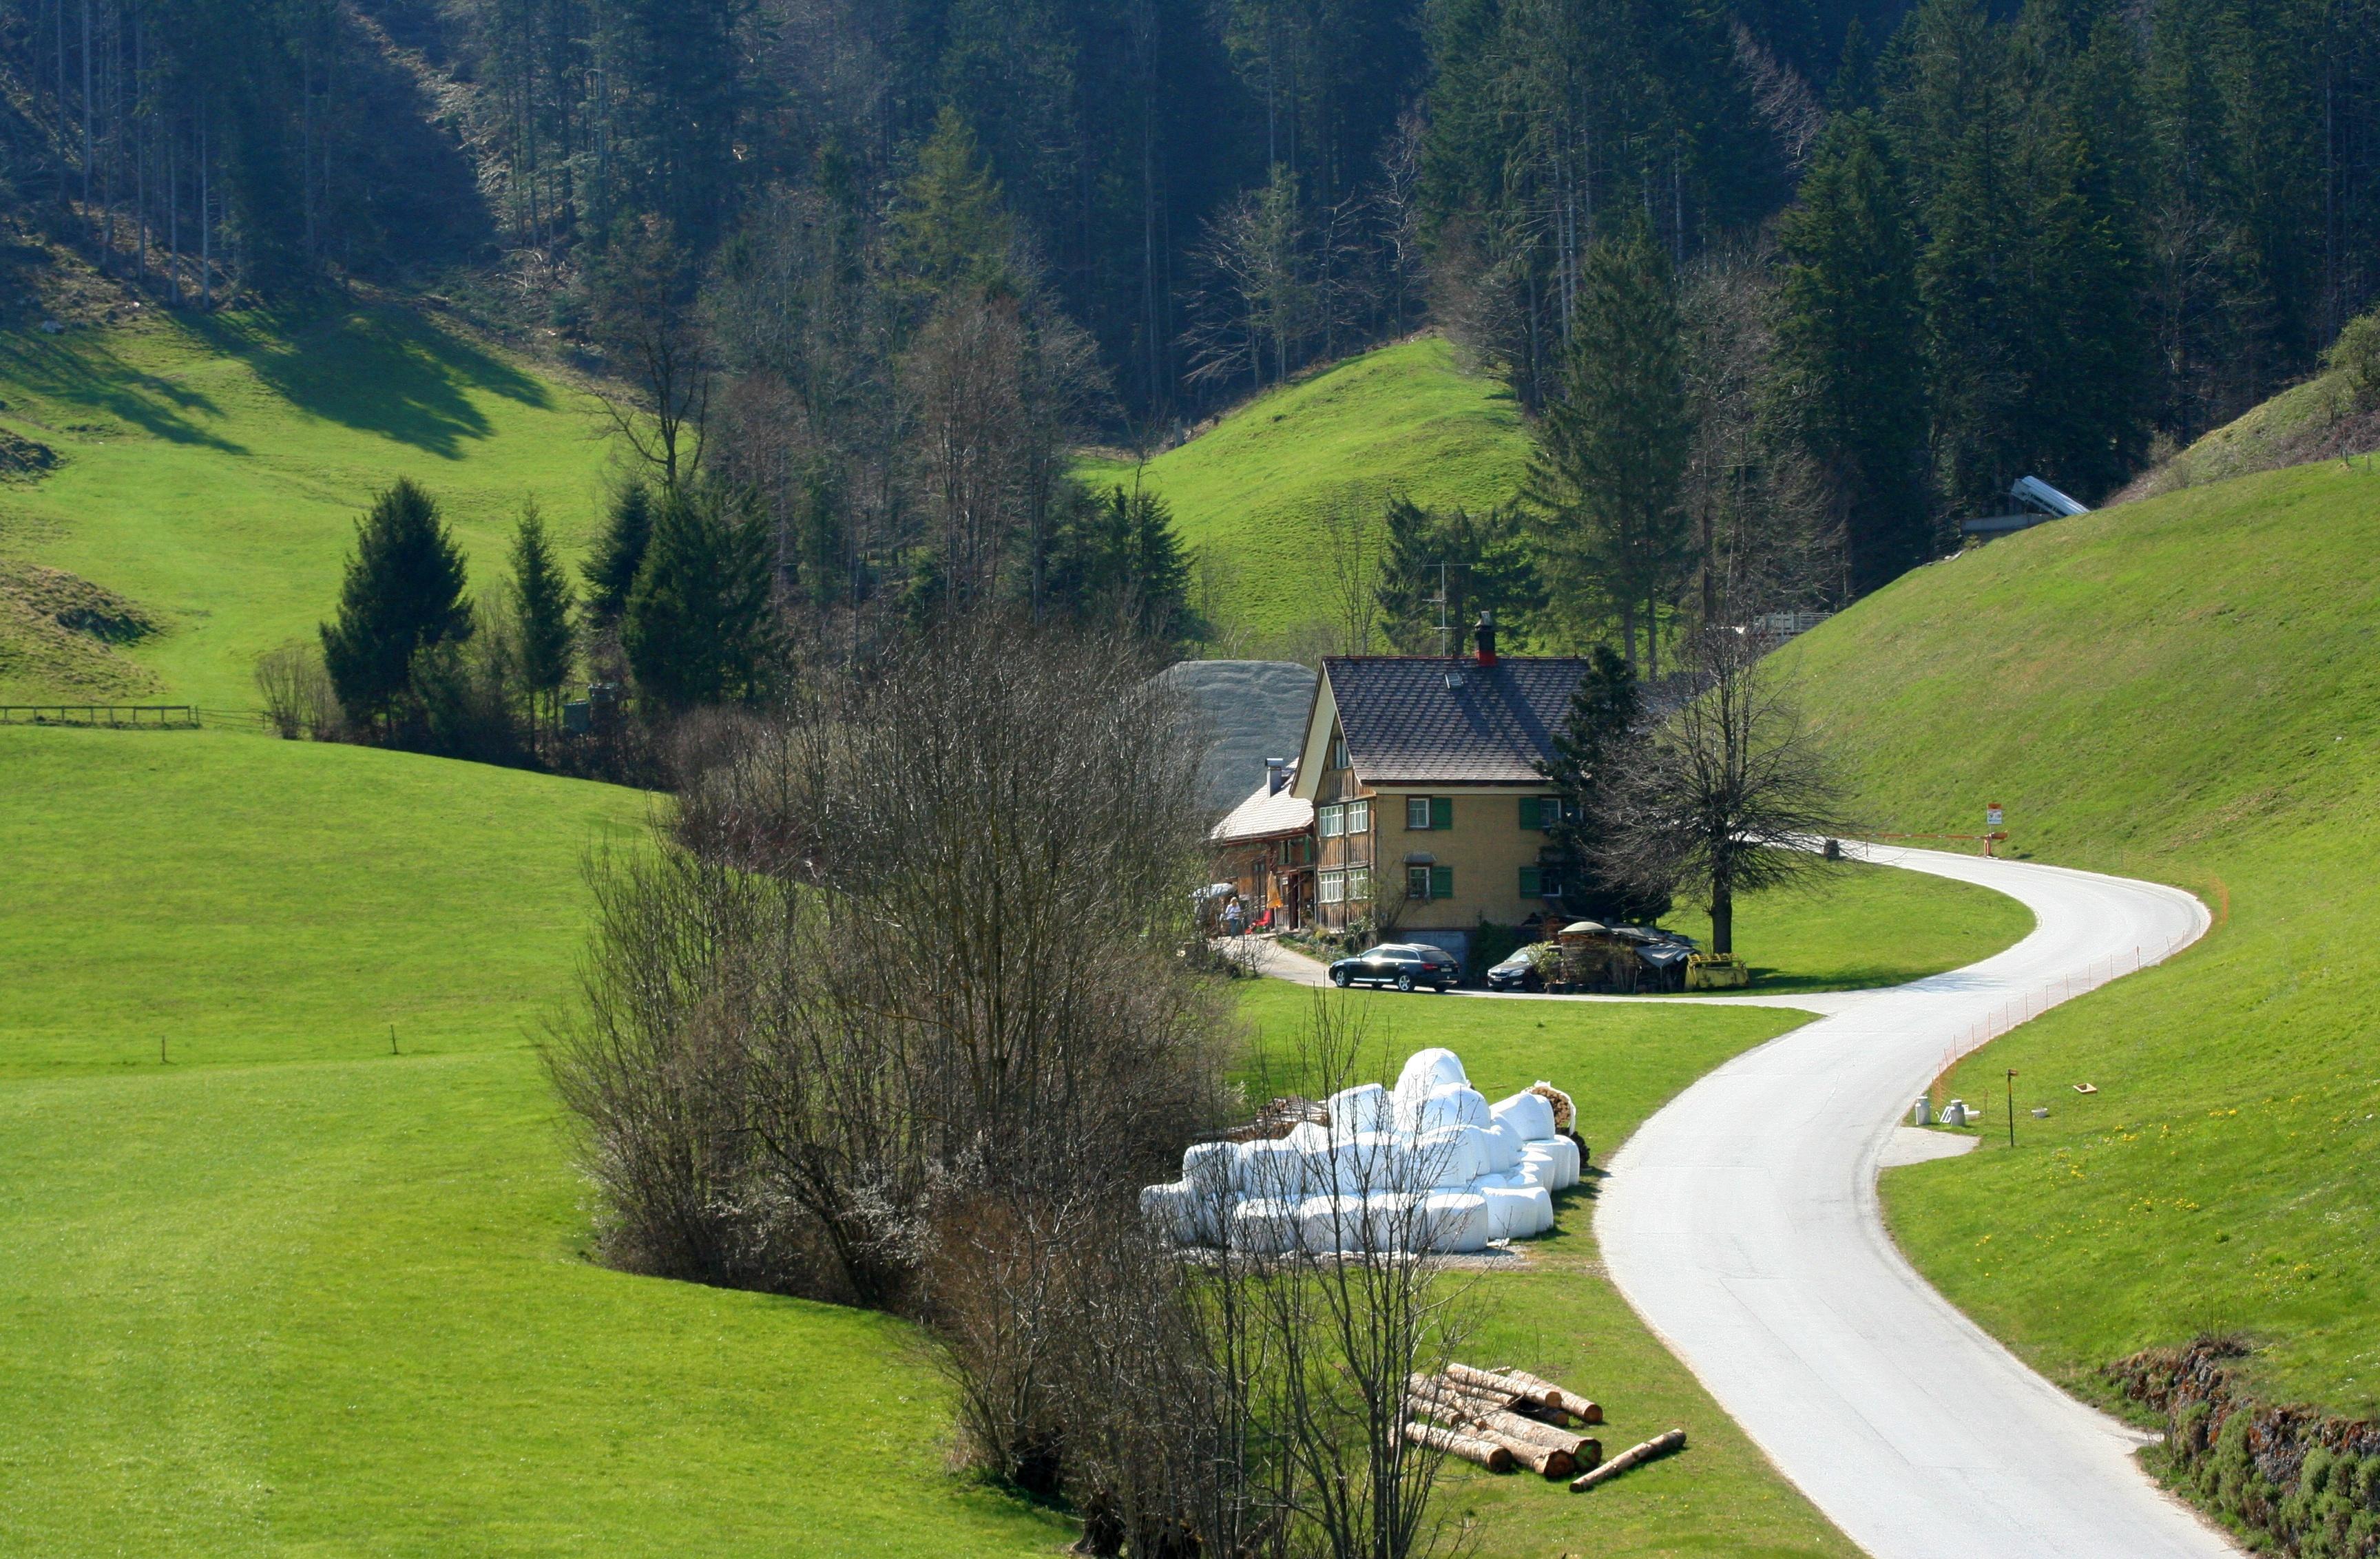 Farming lifestyle in Appenzell Innerrhoden